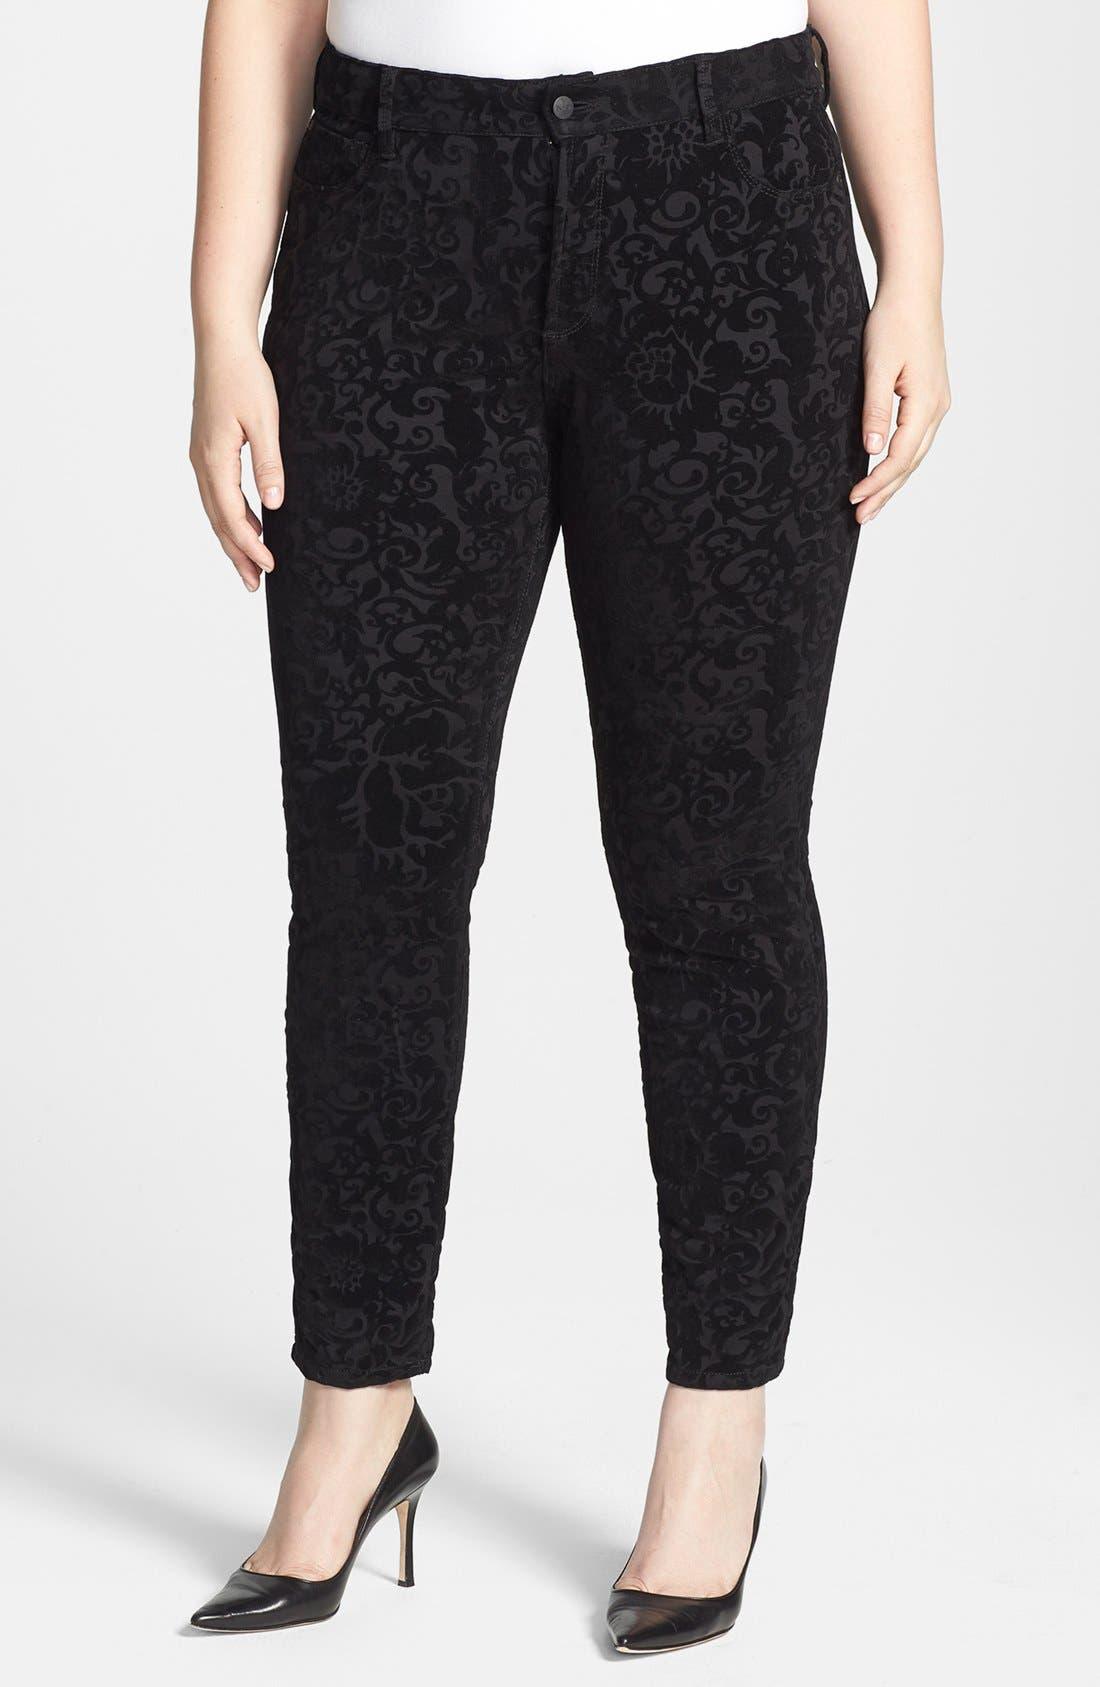 Alternate Image 1 Selected - NYDJ 'Sheri' Flocked Stretch Skinny Jeans (Plus Size)